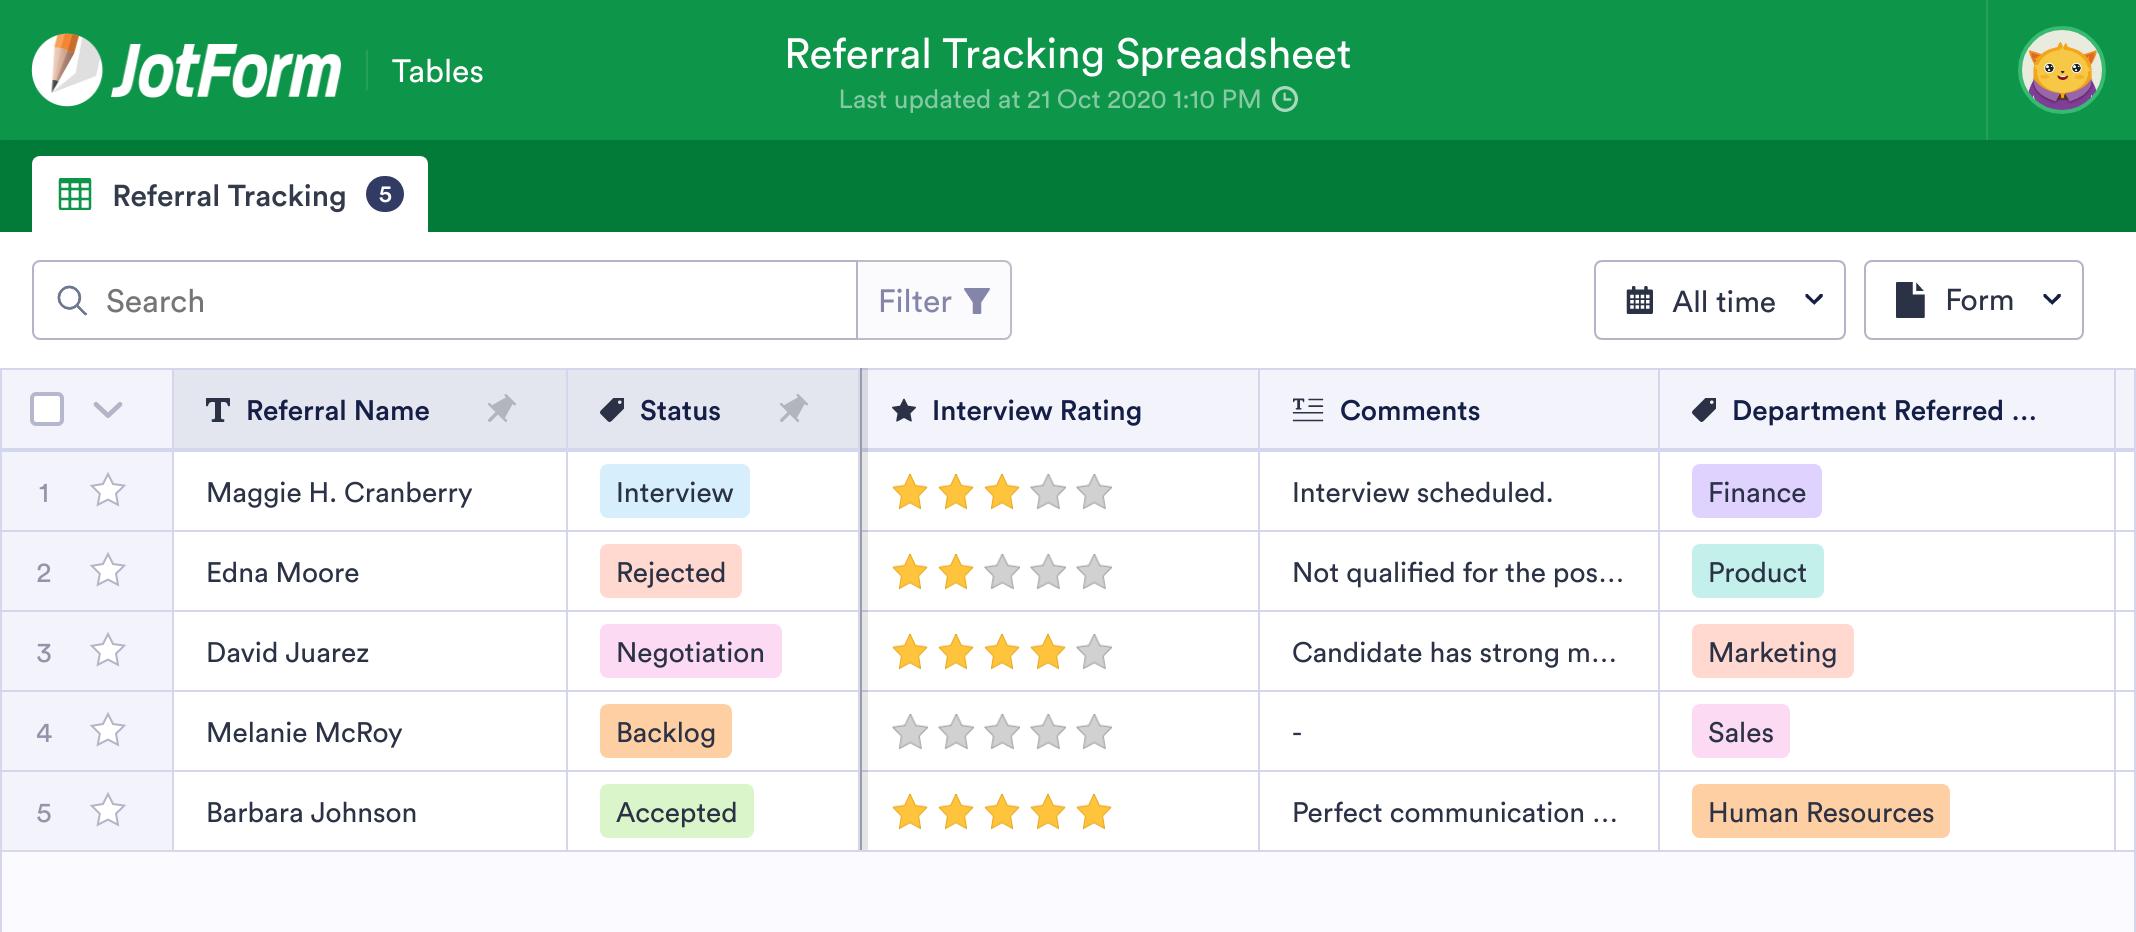 Referral Tracking Spreadsheet